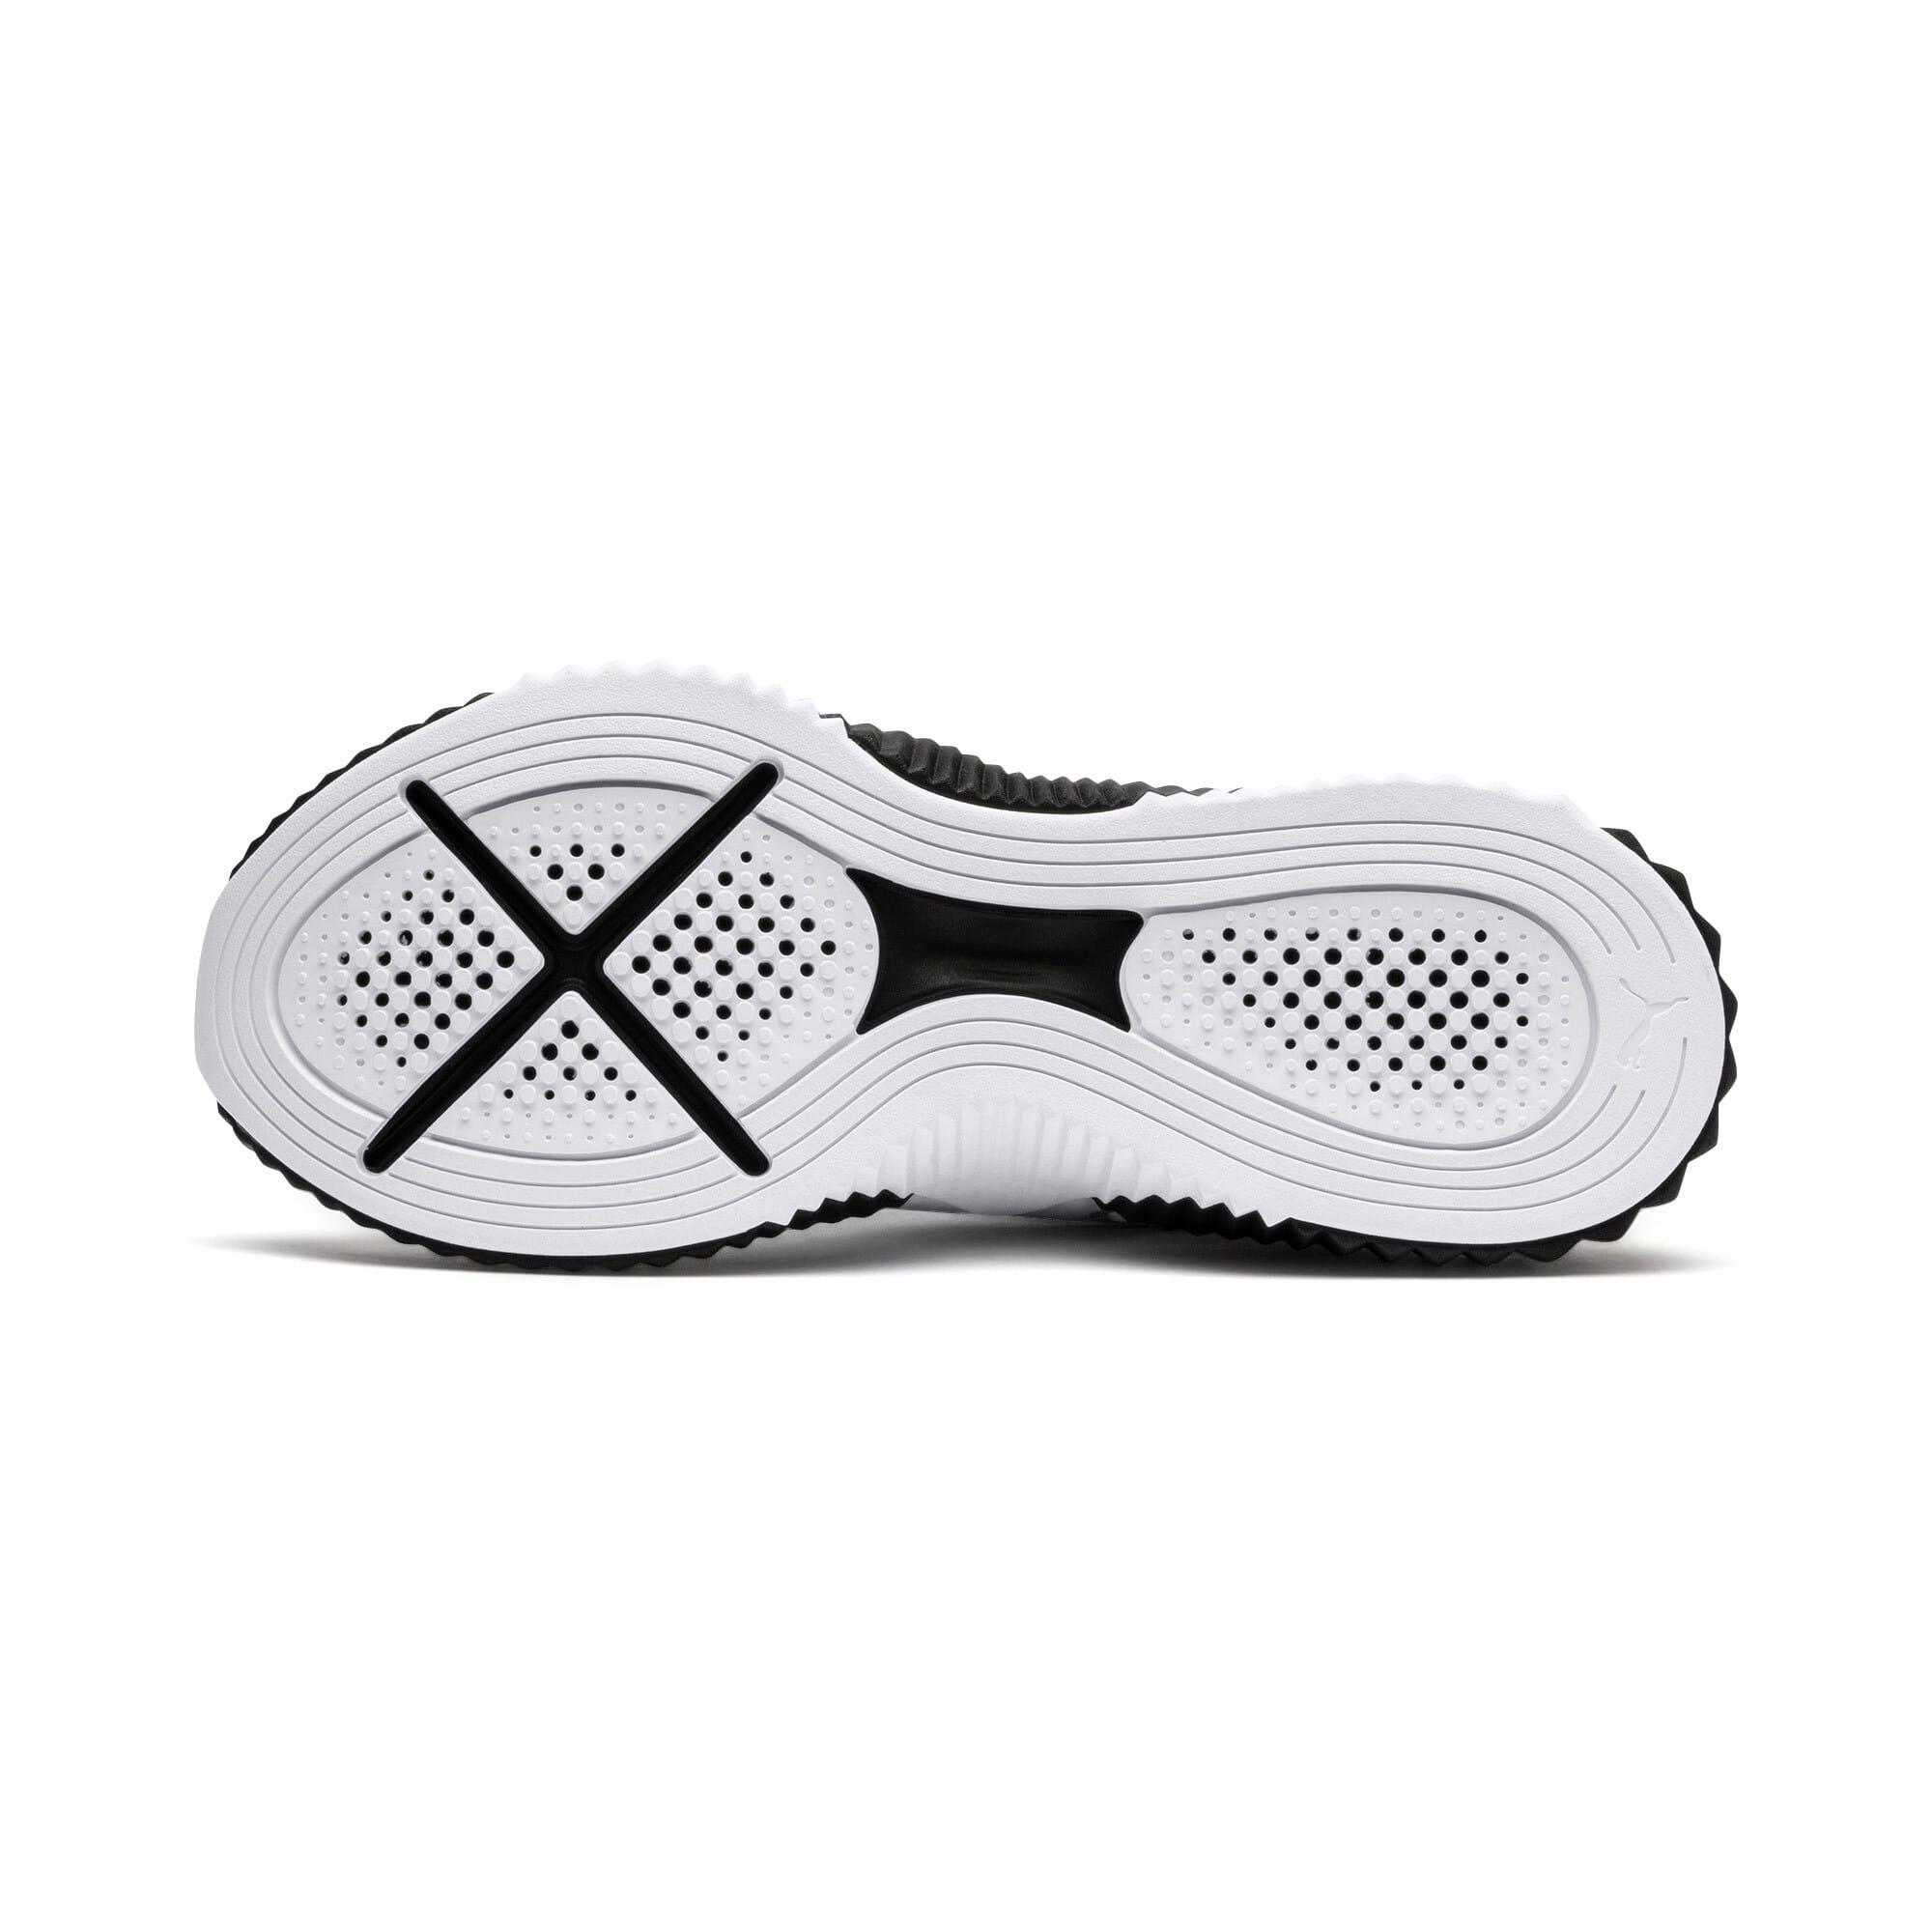 Thumbnail 3 of Defy Damen Sneaker, Puma White-Puma Black, medium